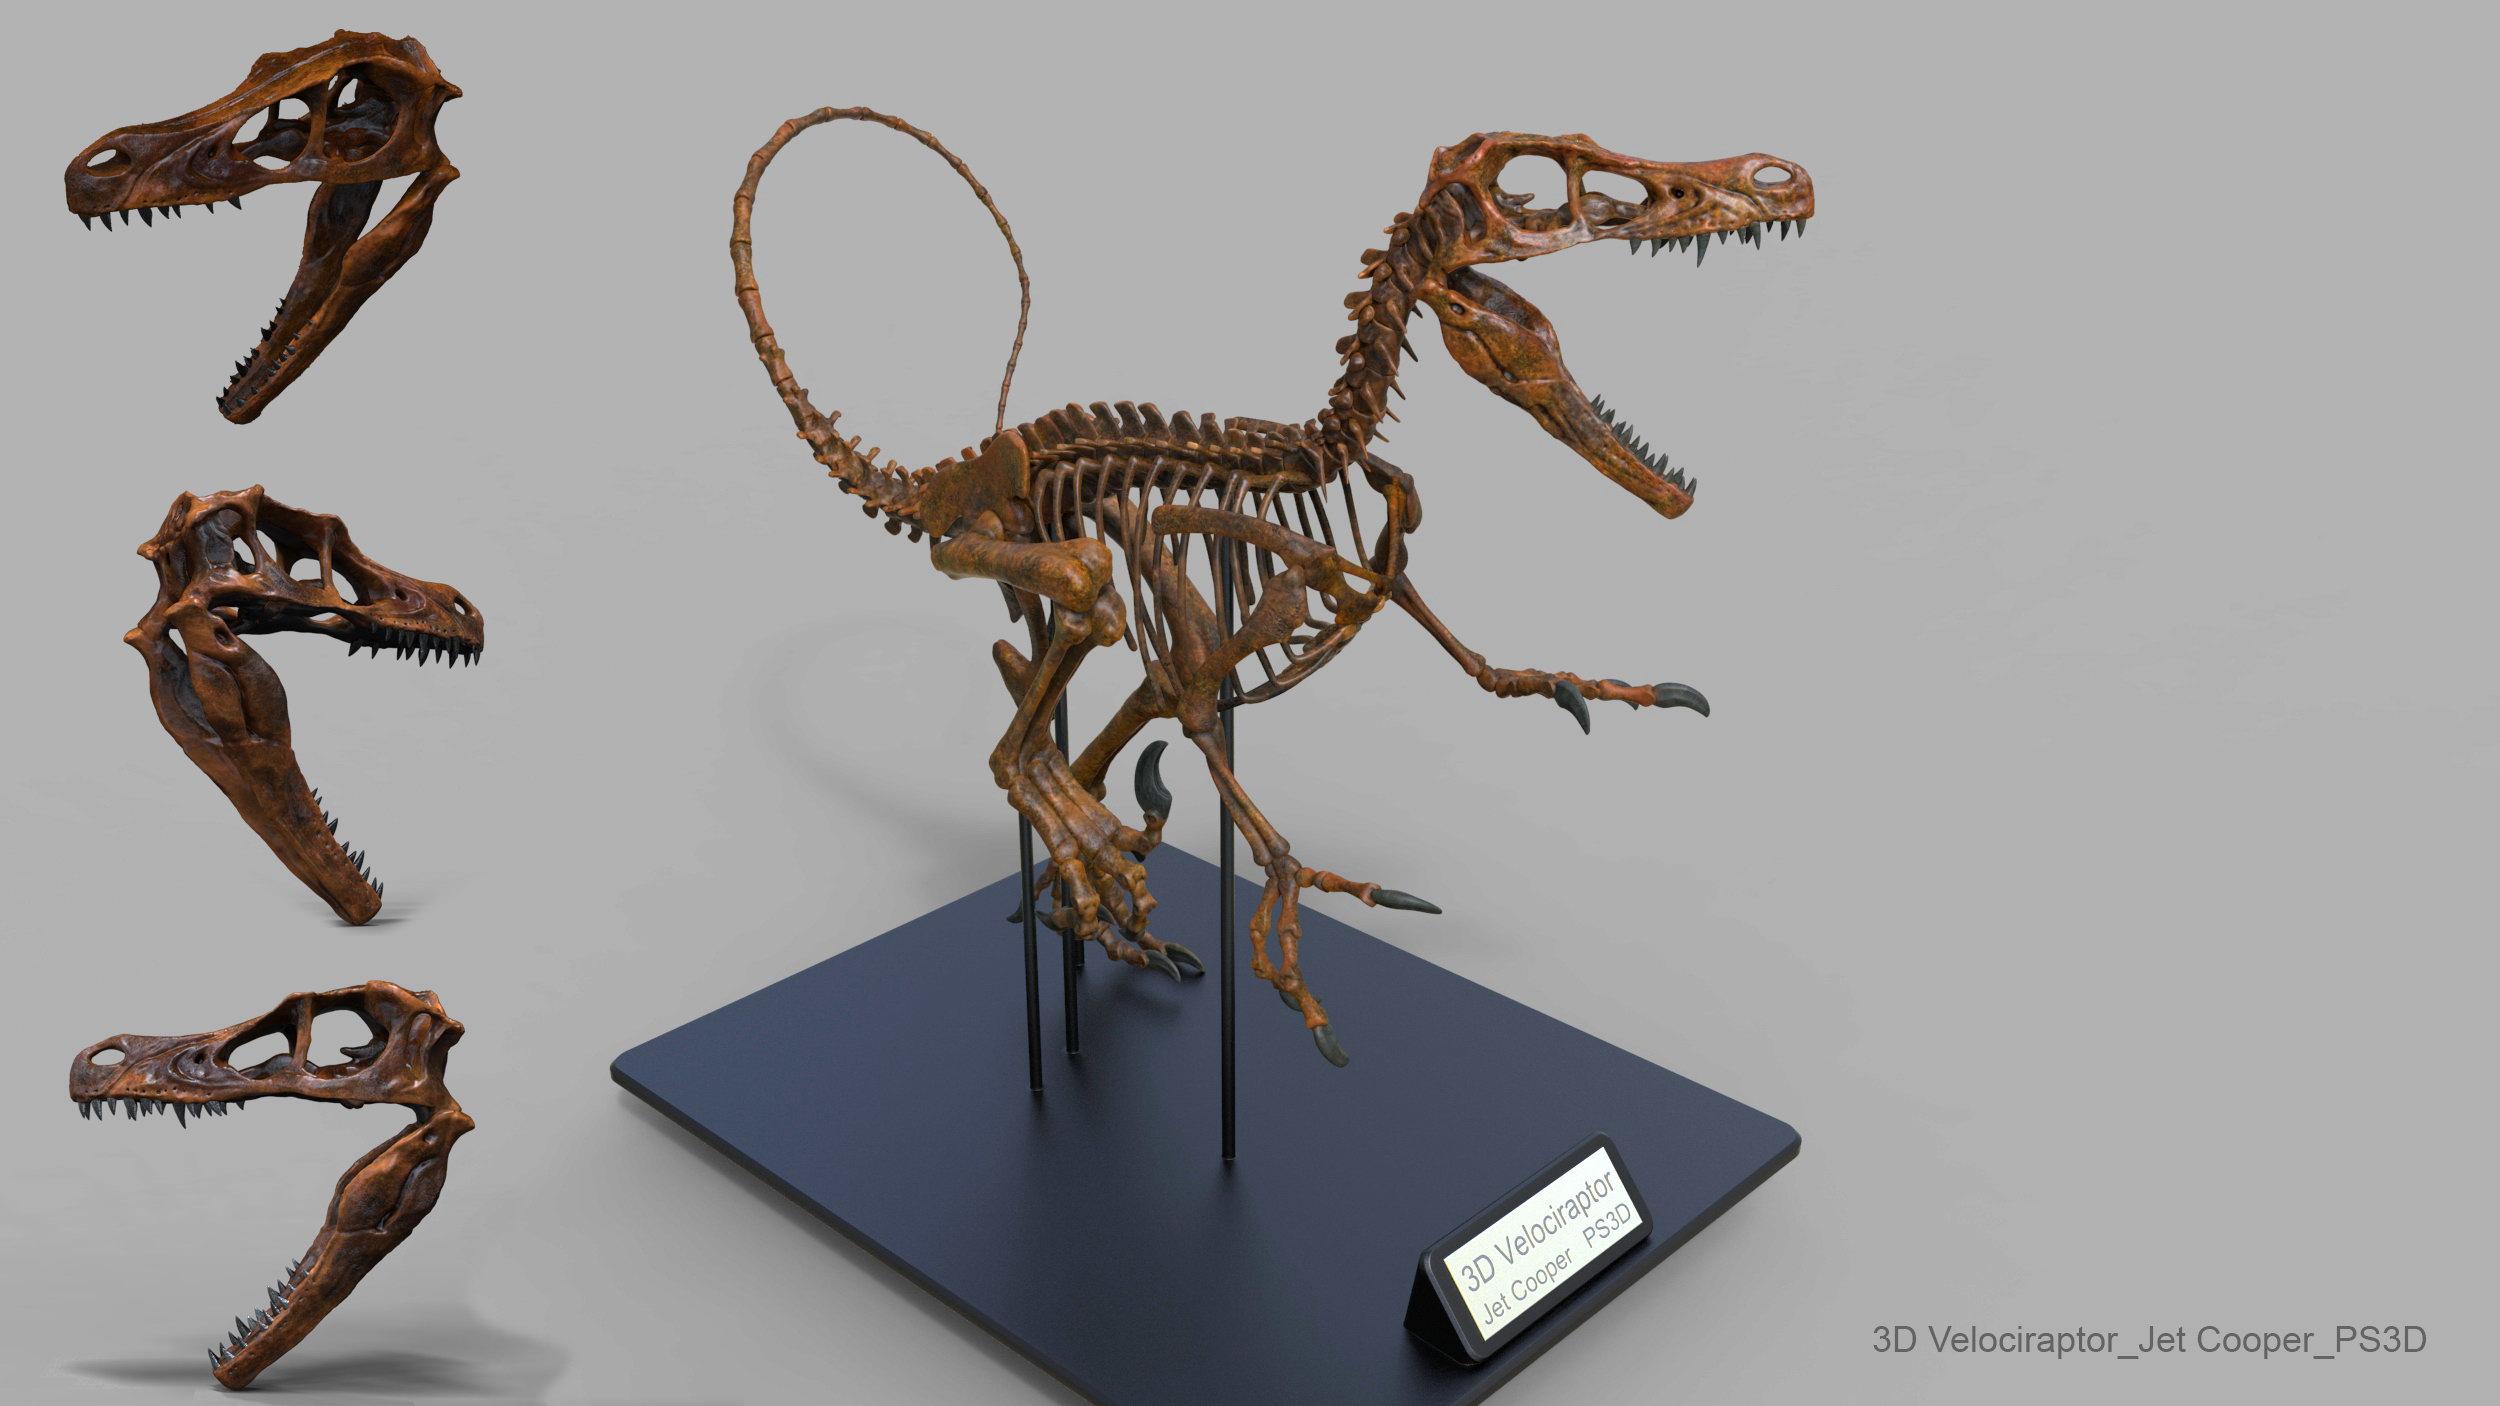 Velociraptor porn erotic video